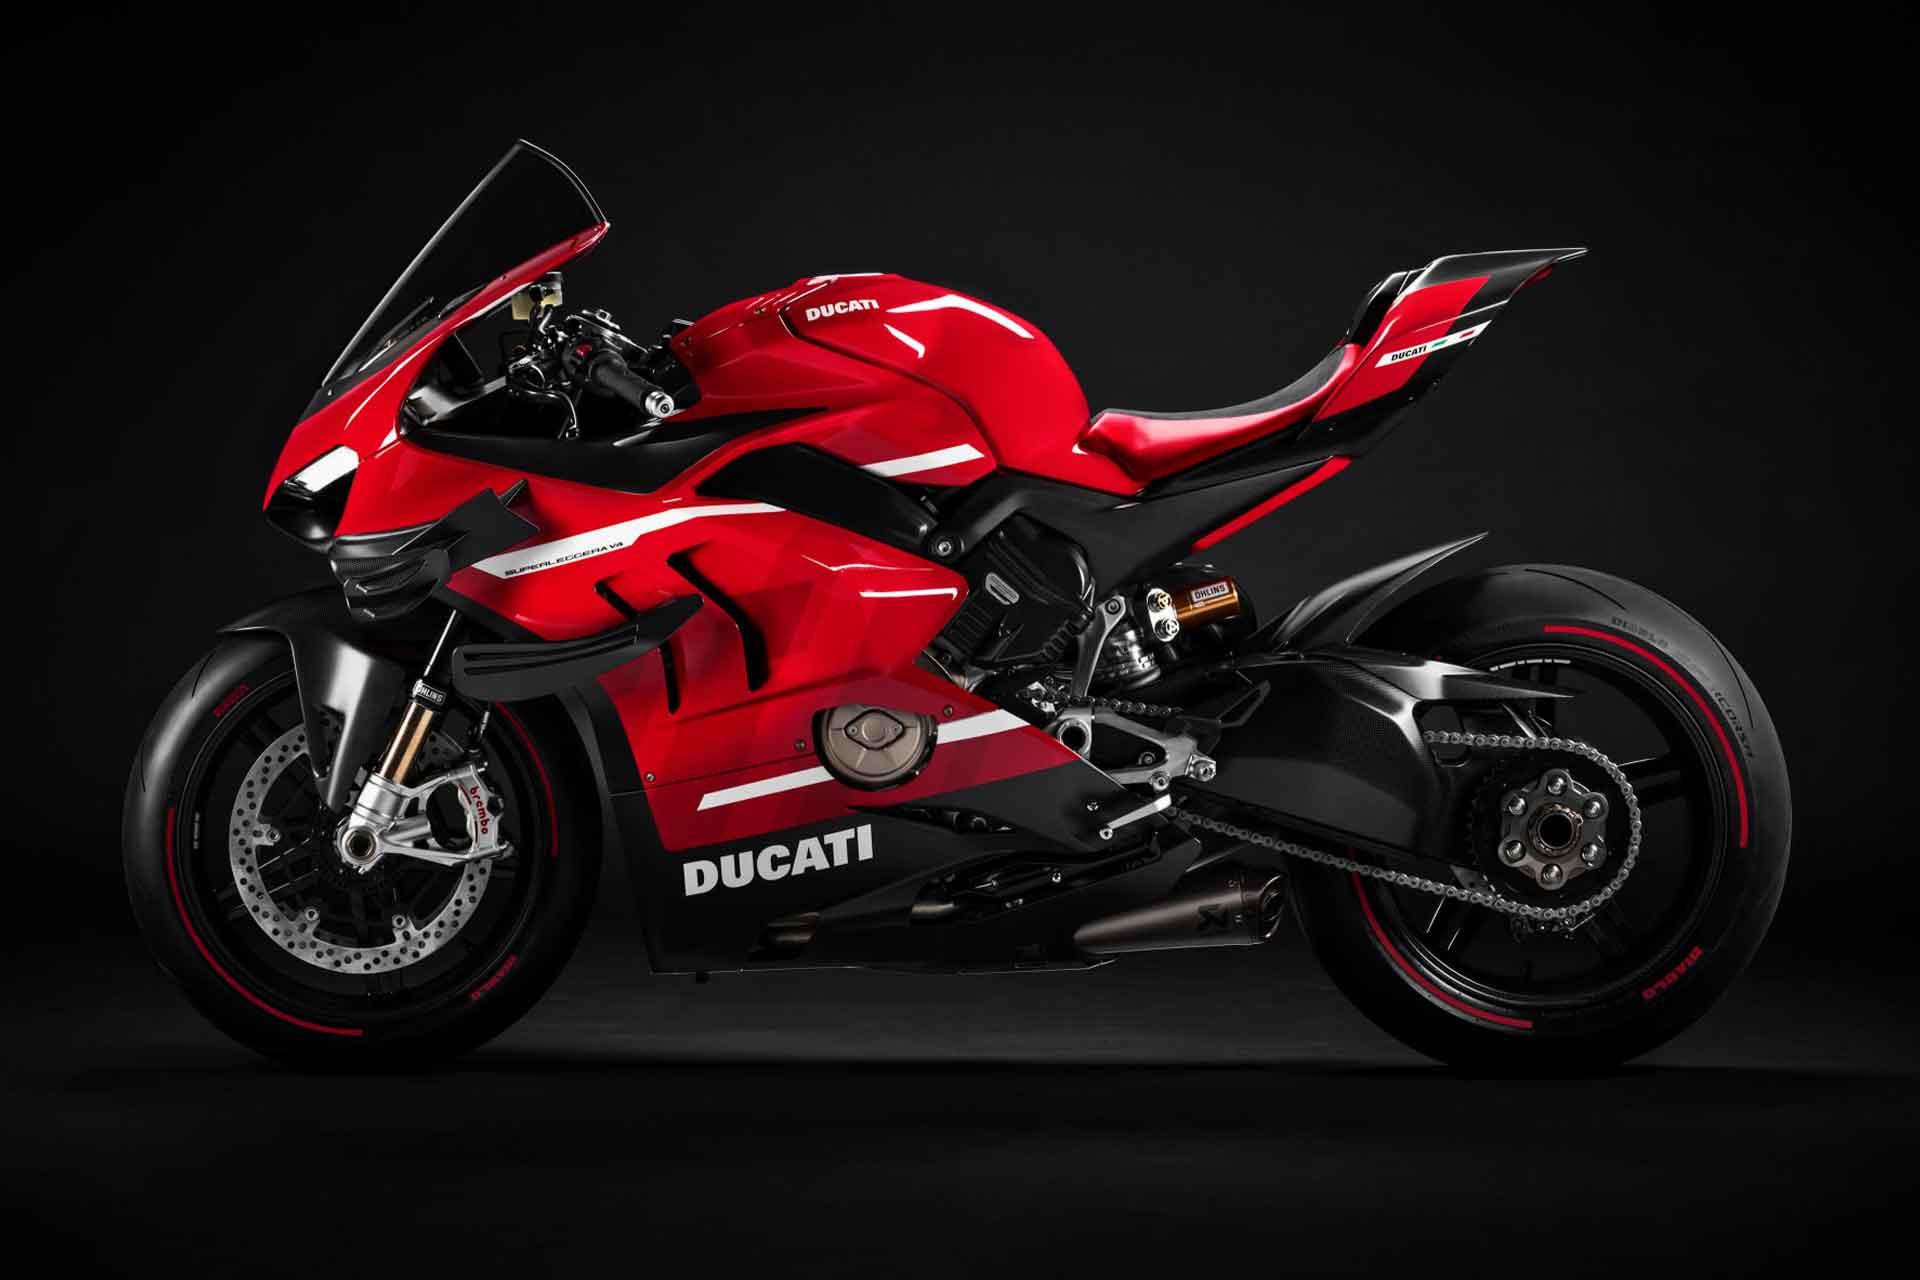 Ducati Superleggera V4 Motorcycle